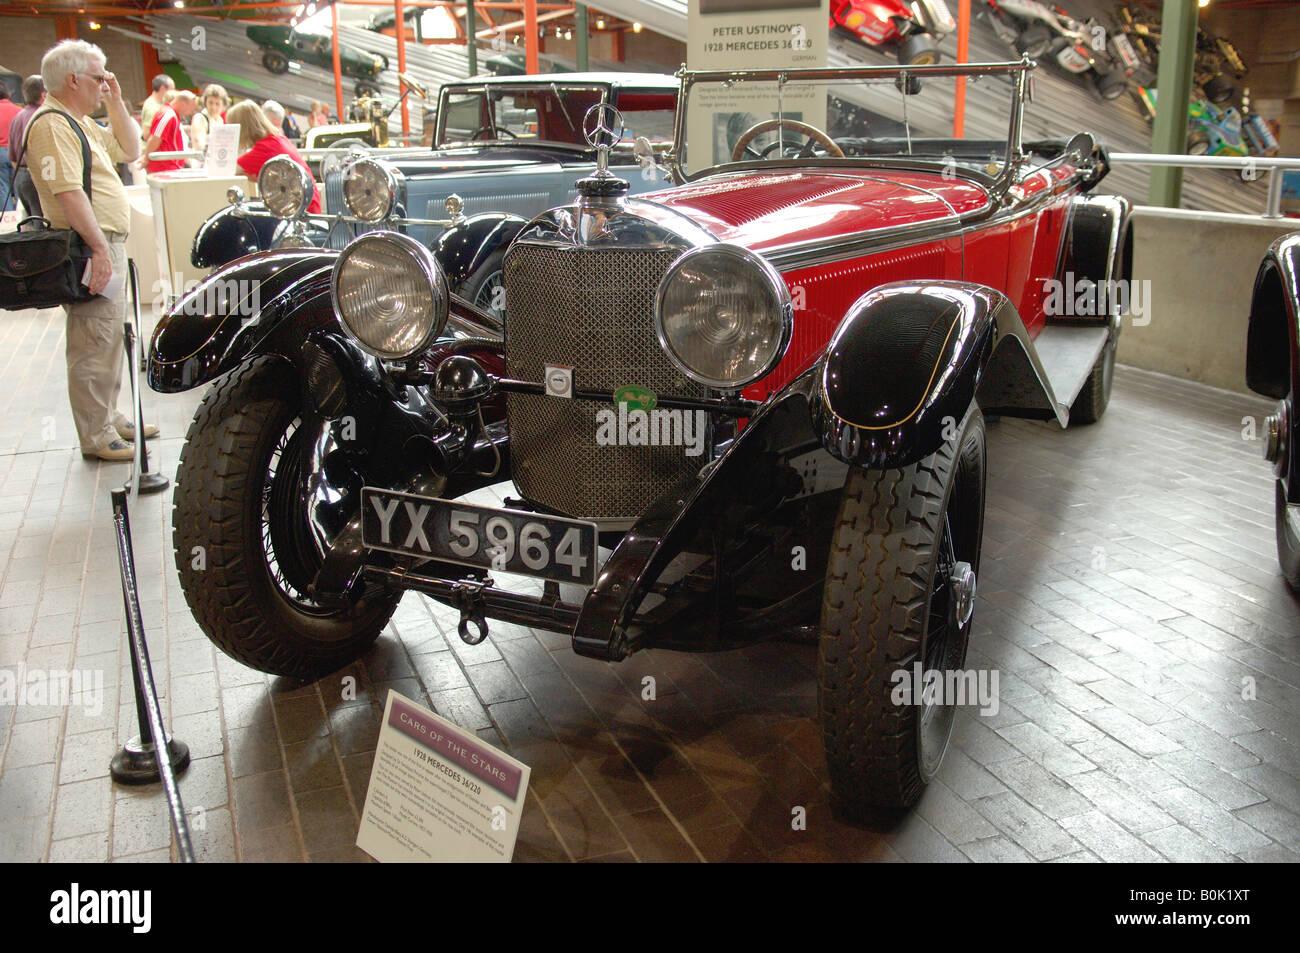 Beaulieu, New Forest, Hampshire, SO42 7ZN, Brockenhurst, Inglaterra, Reino Unido, para coleccionistas, estrella autos, NMM Trust, Conducción, conductor, Foto de stock